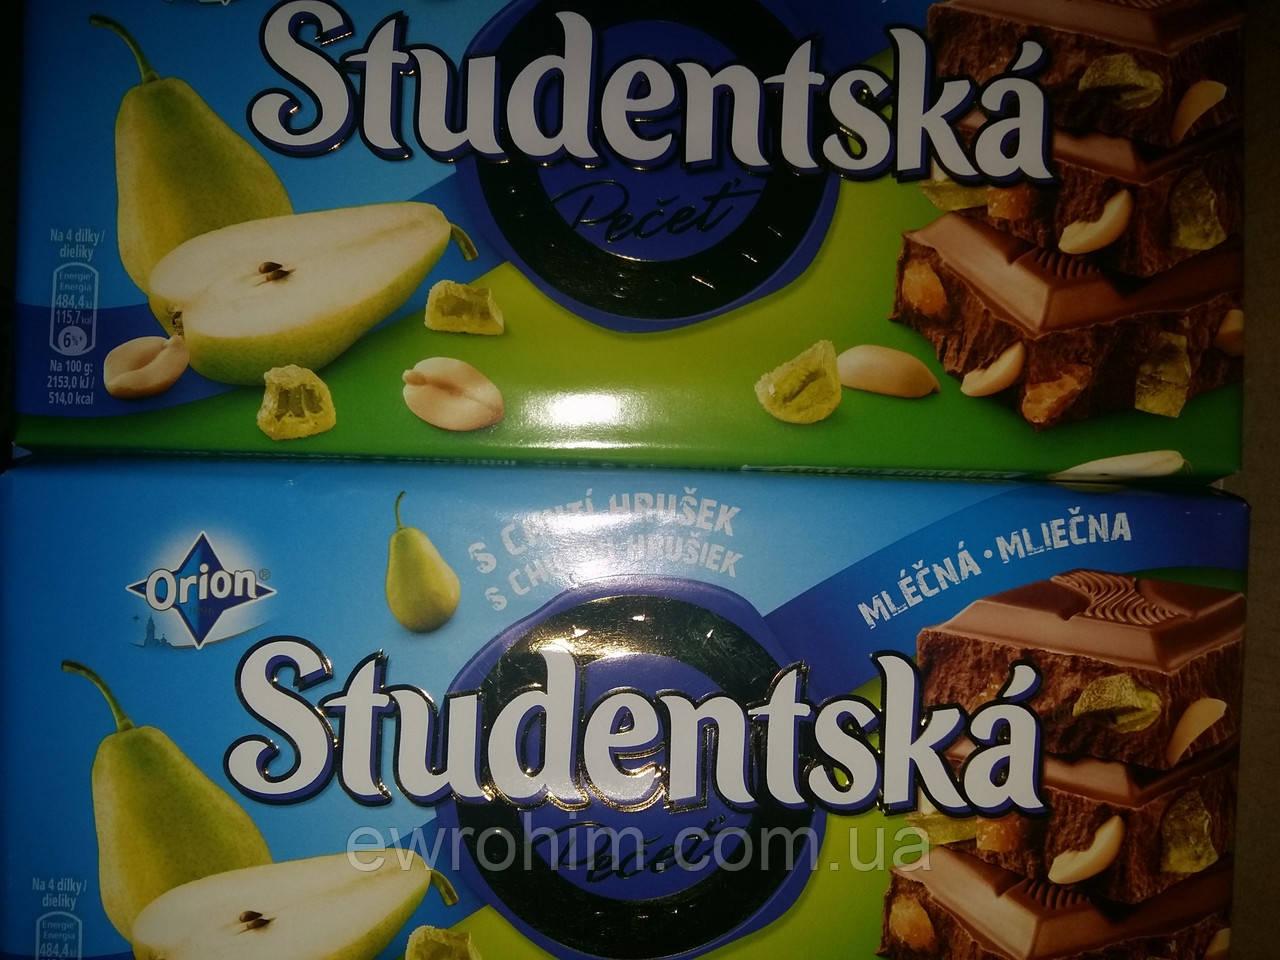 Шоколад Studentska груша/арахис в молочном шоколаде 180 г